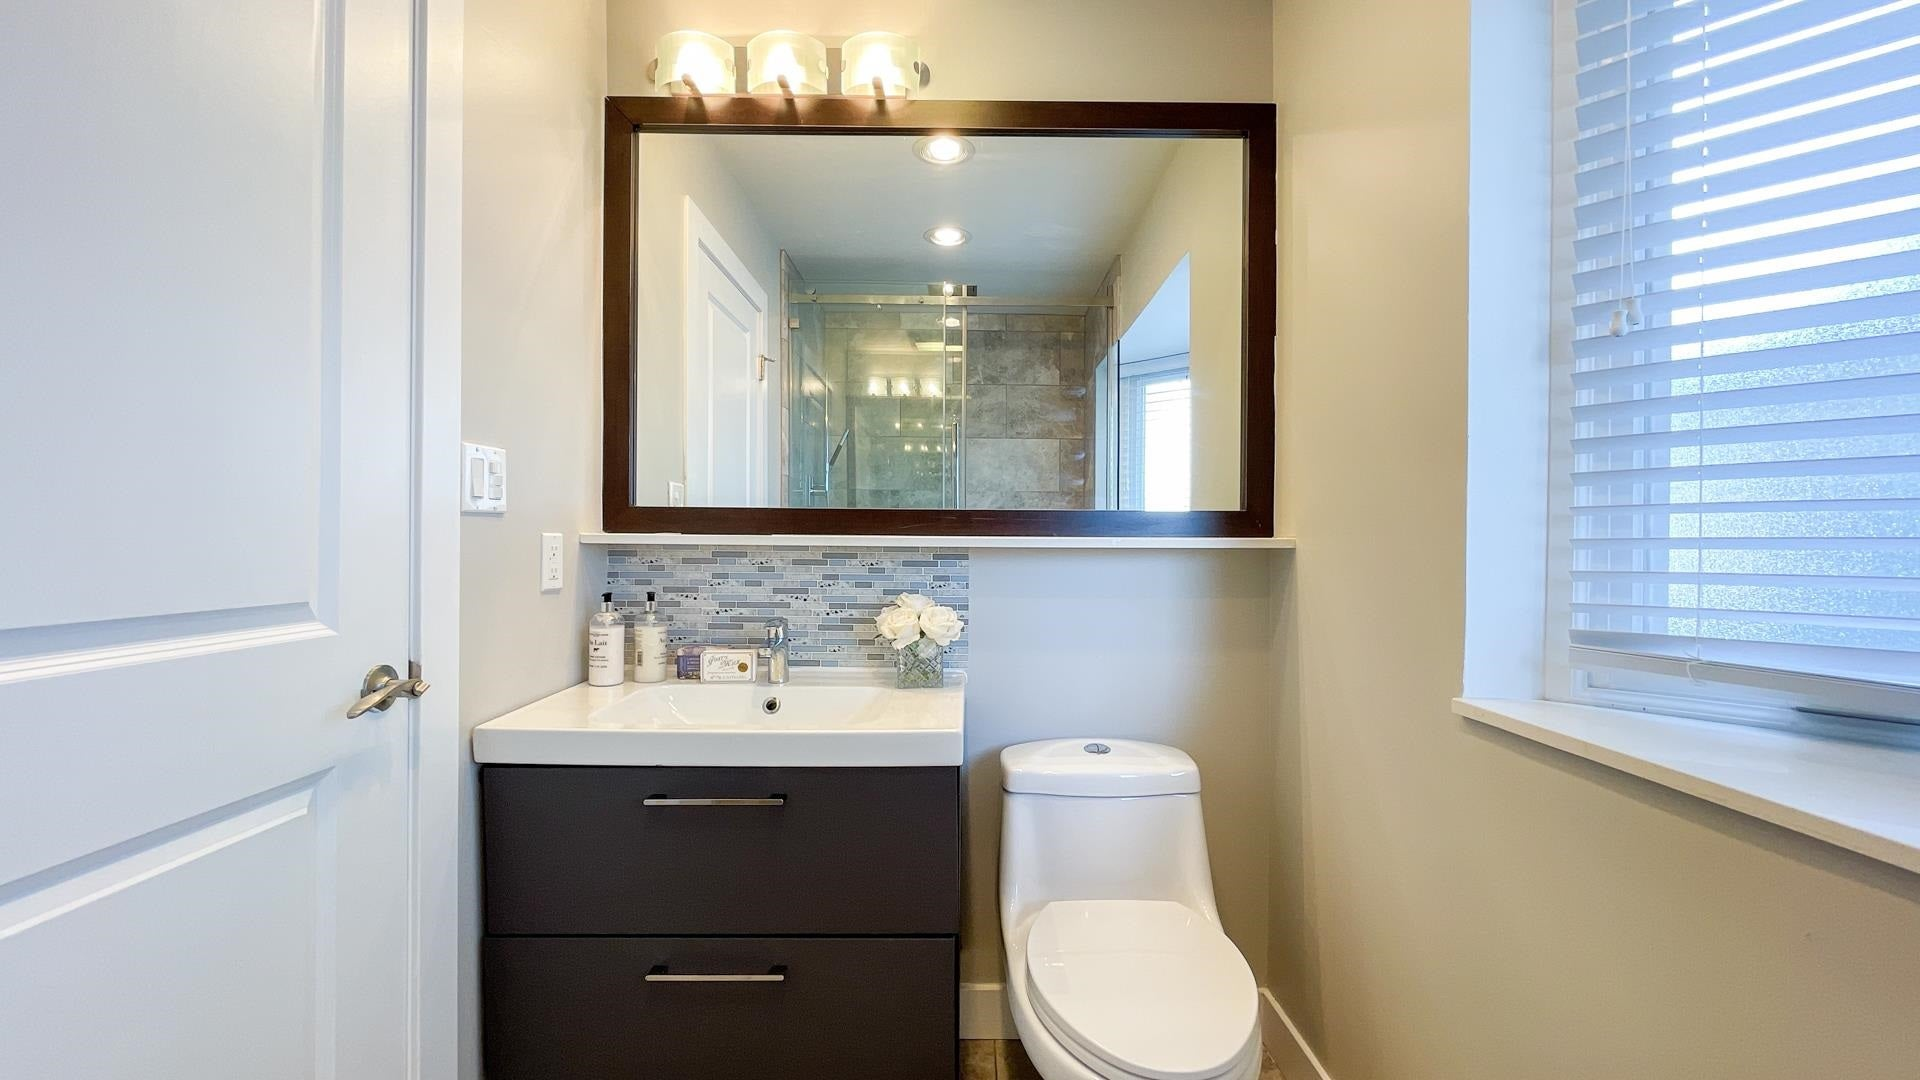 1168 JEFFERSON AVENUE - Ambleside House/Single Family for sale, 6 Bedrooms (R2602275) - #14